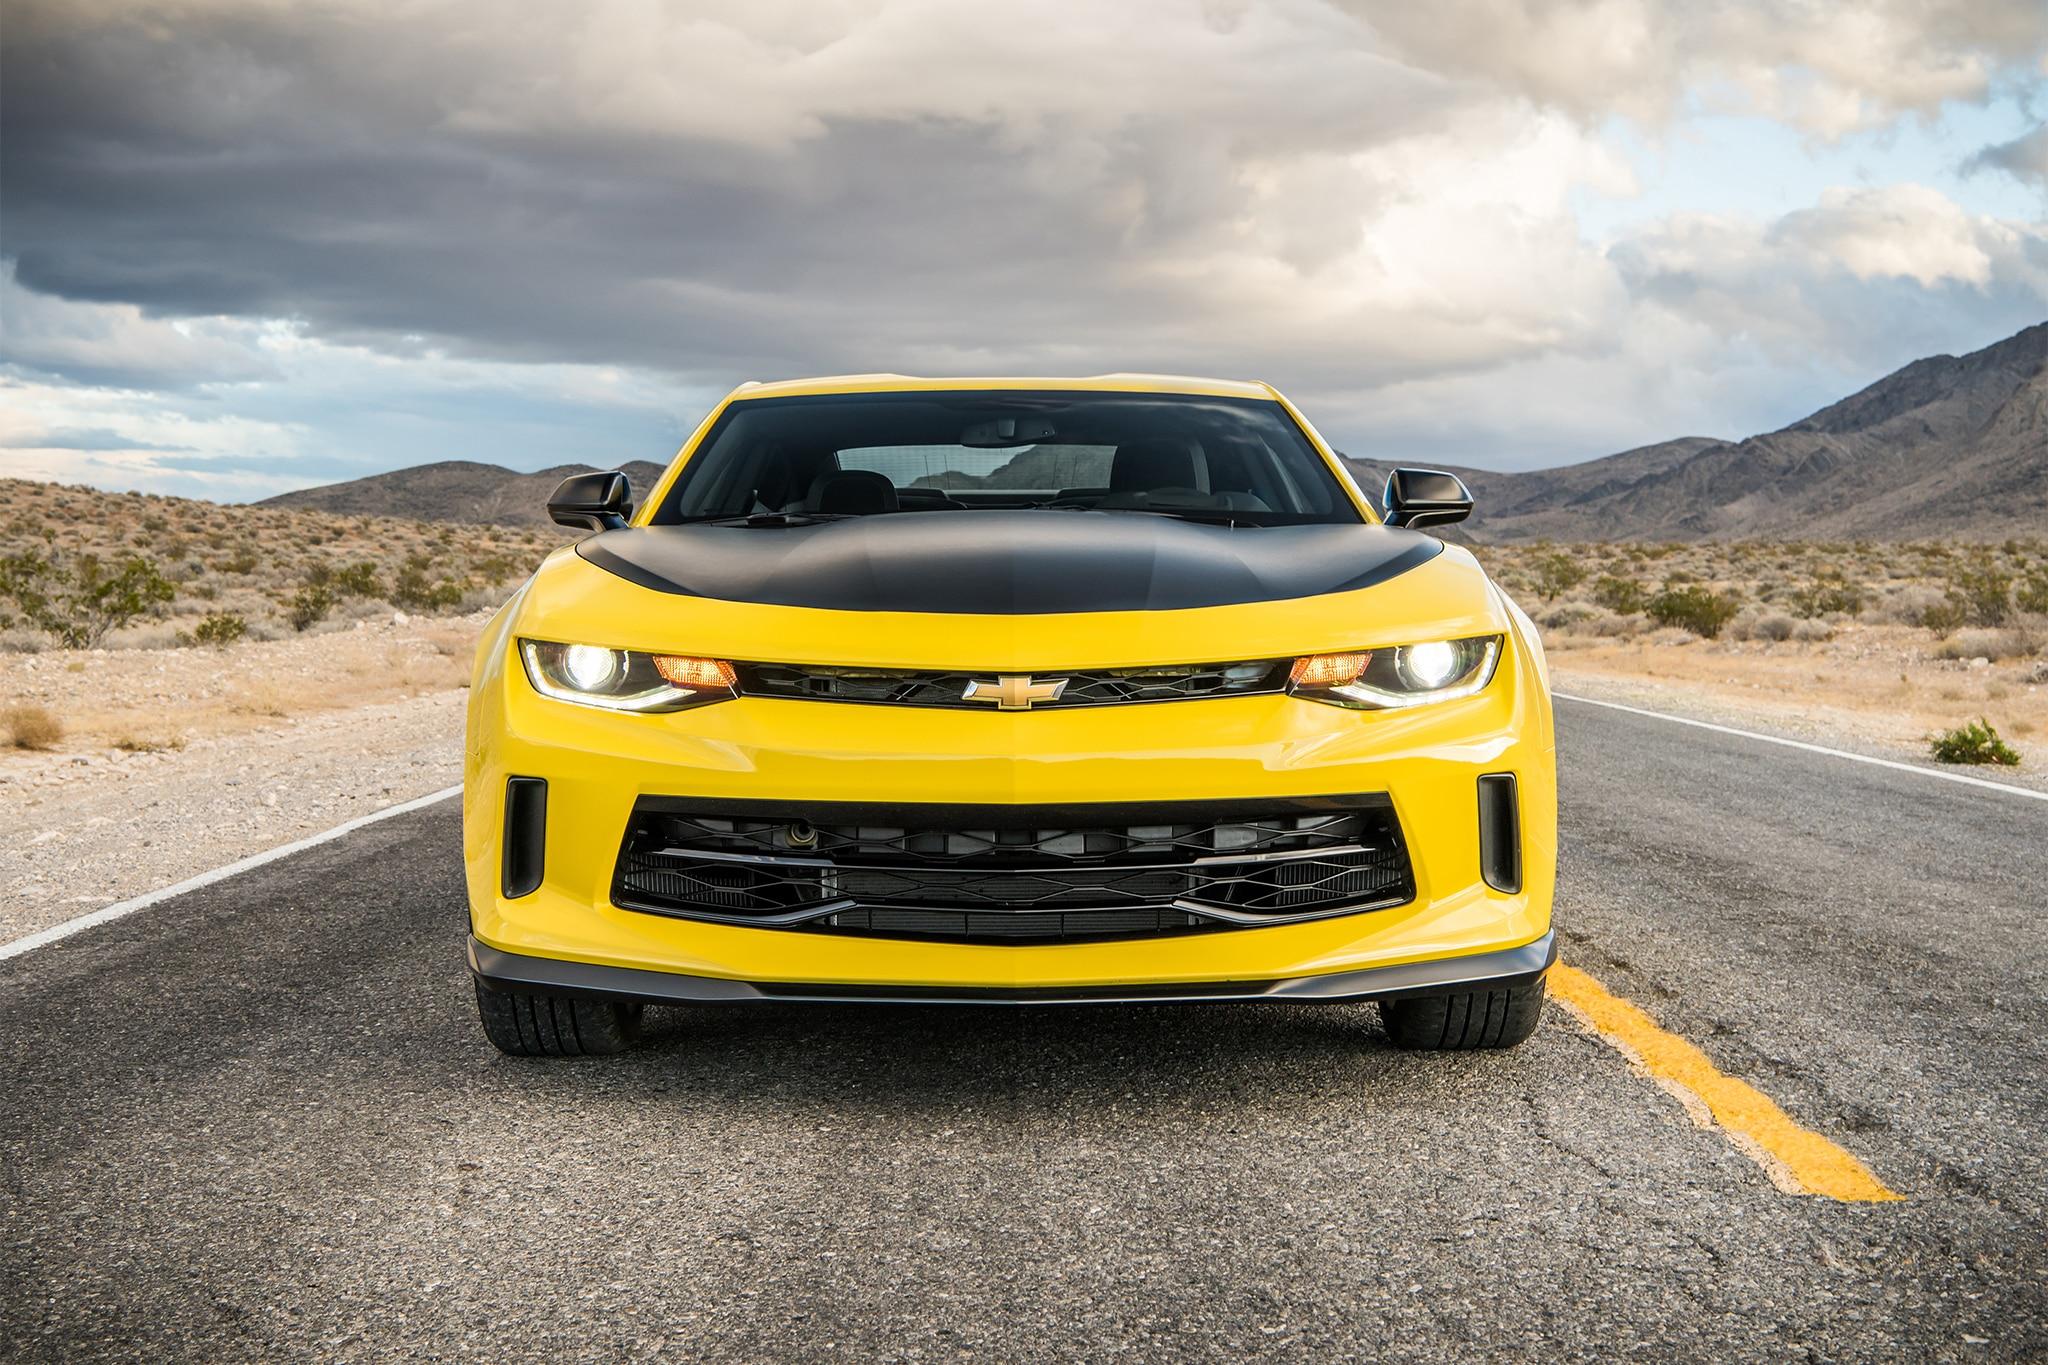 2017 chevrolet camaro v 6 1le front view 01 - Chevrolet Performance Camaro V 6 And V 8 Concepts